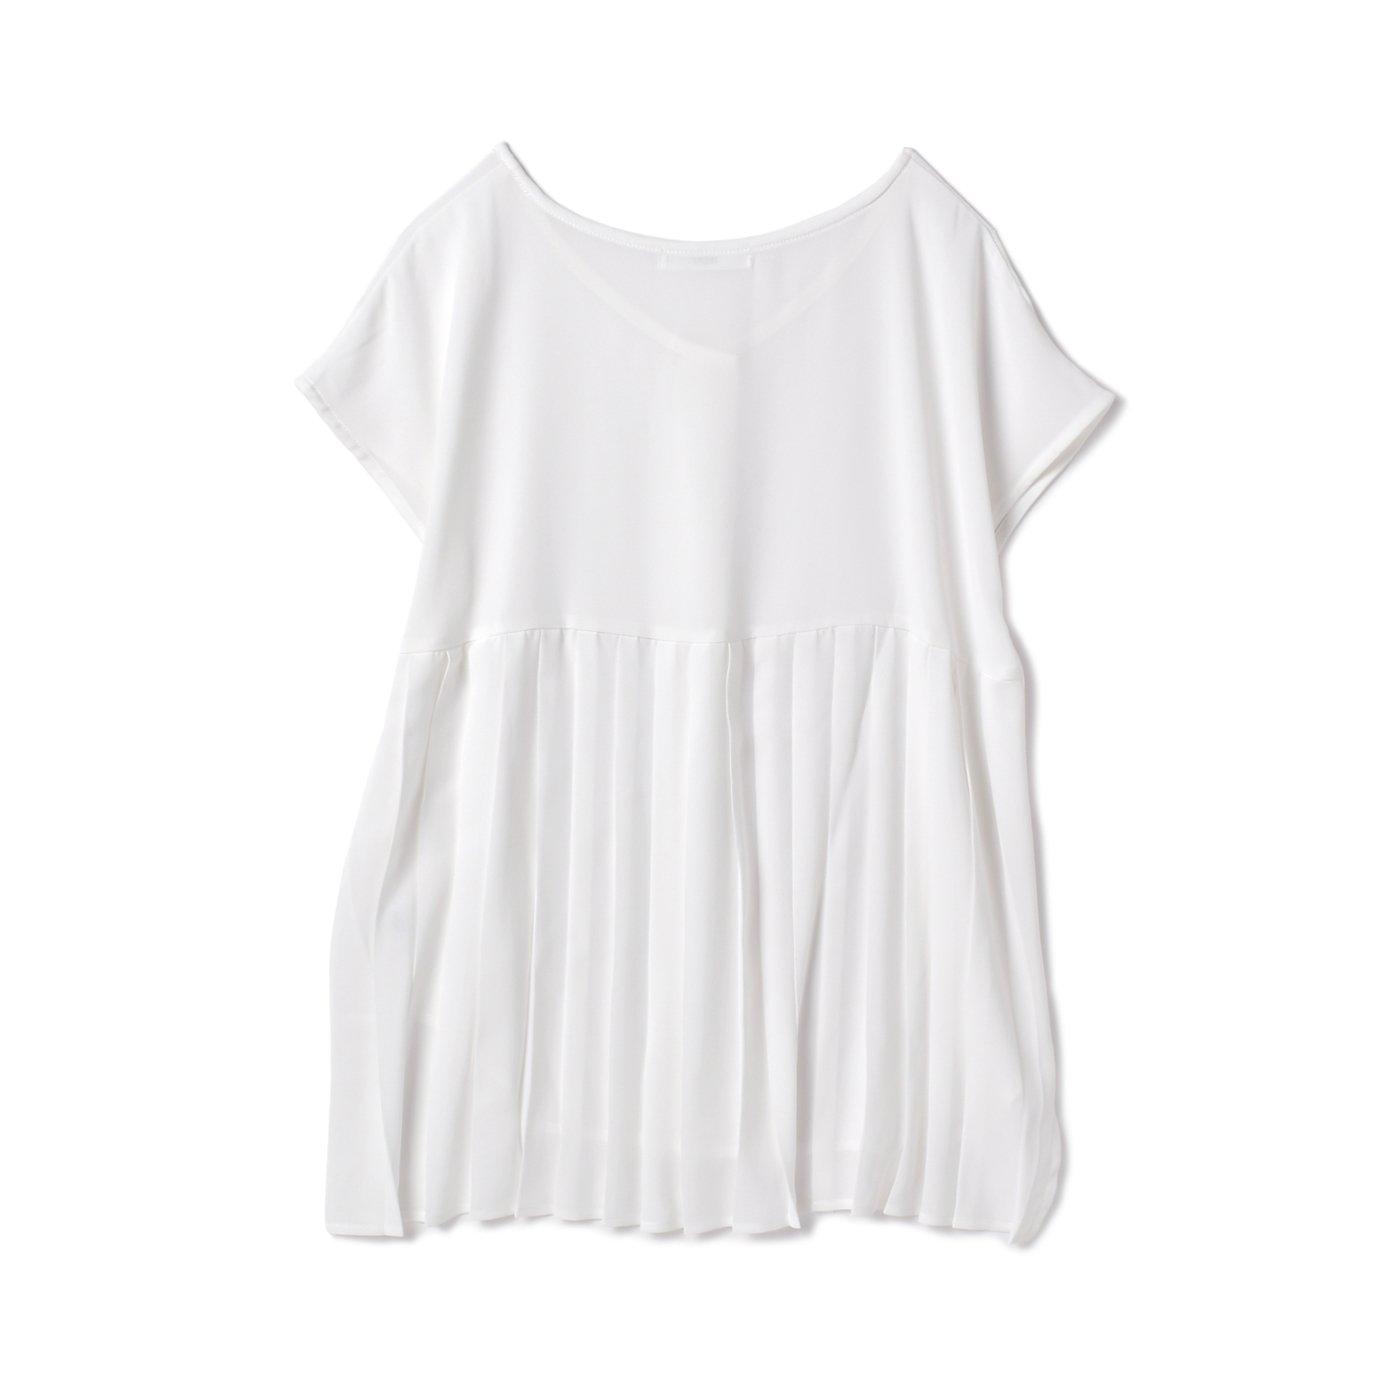 DRECO by IEDIT バックプリーツが美しい上品ホワイトトップス〈ホワイト〉